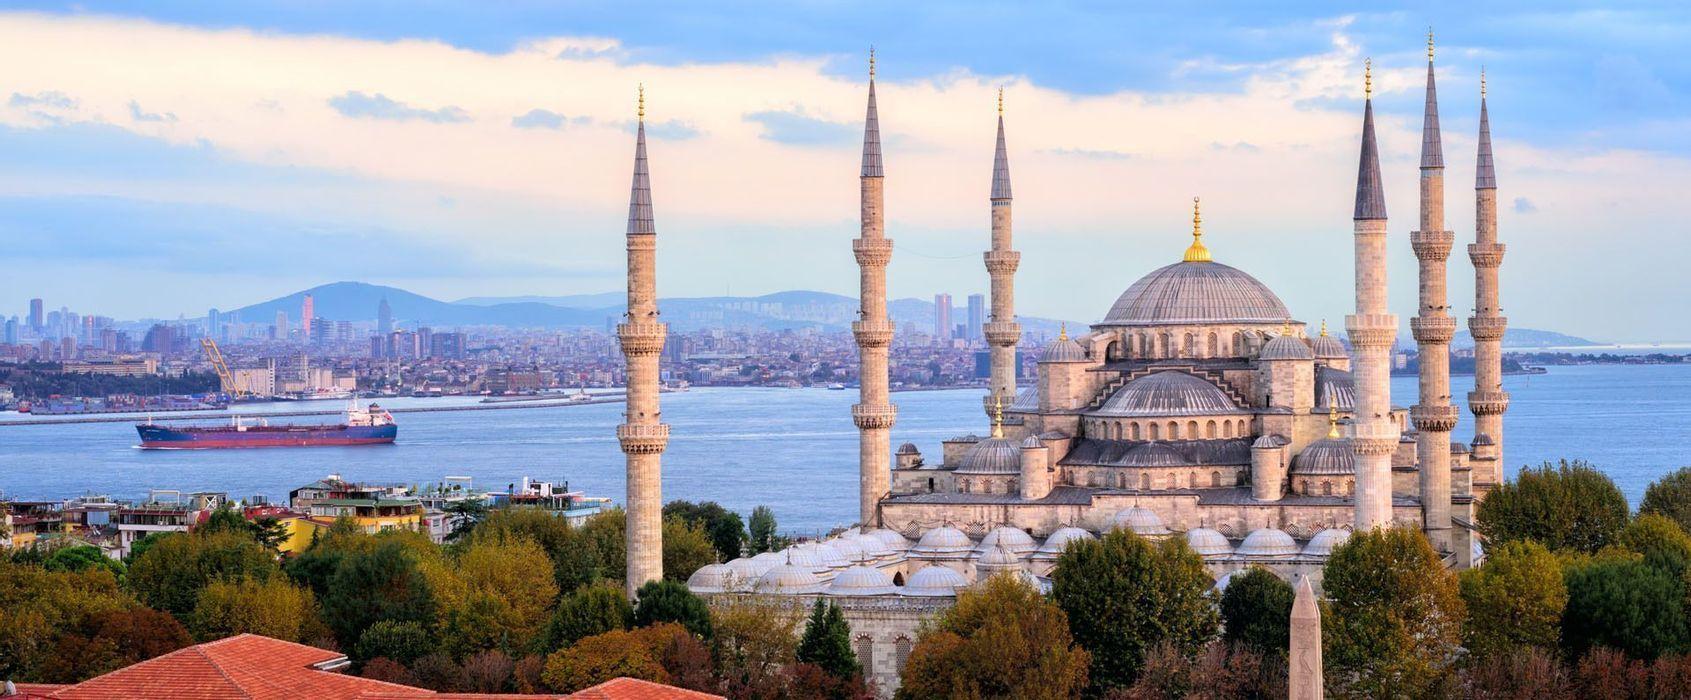 Turchia 360°